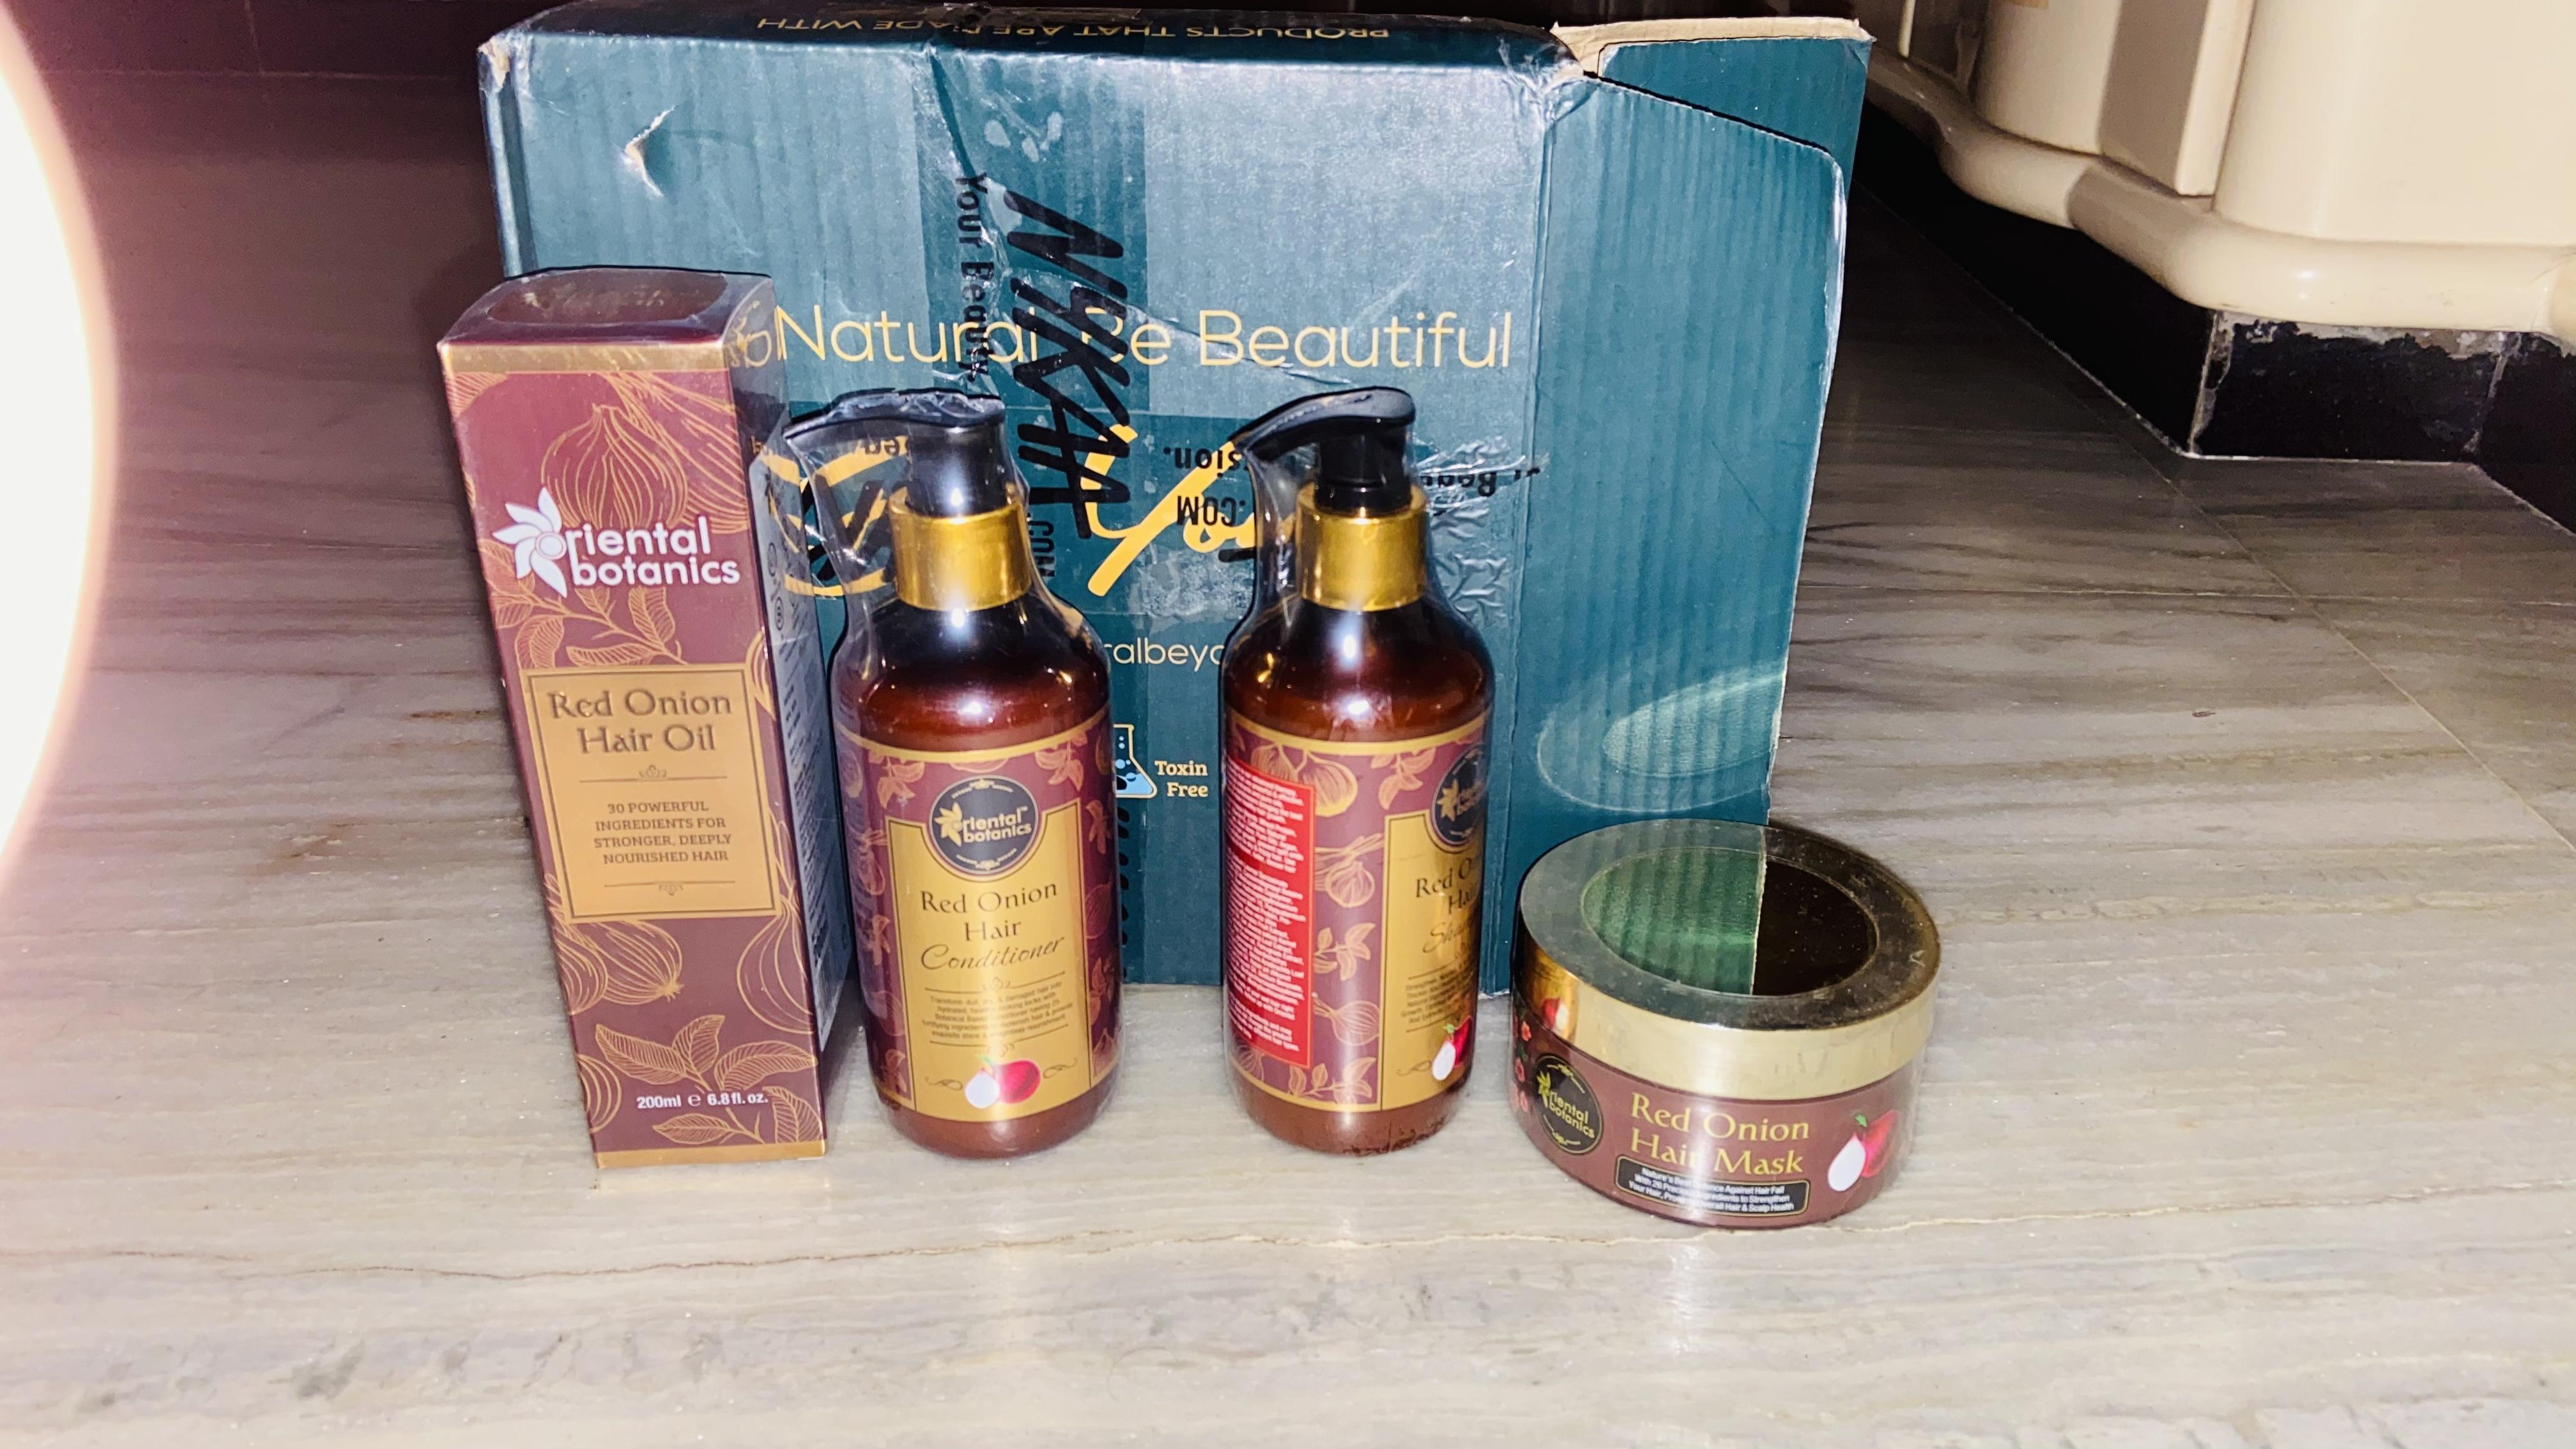 Oriental Botanics Red Onion Hair Shampoo + Conditioner + Oil -Best hair kit-By bharti_jain1